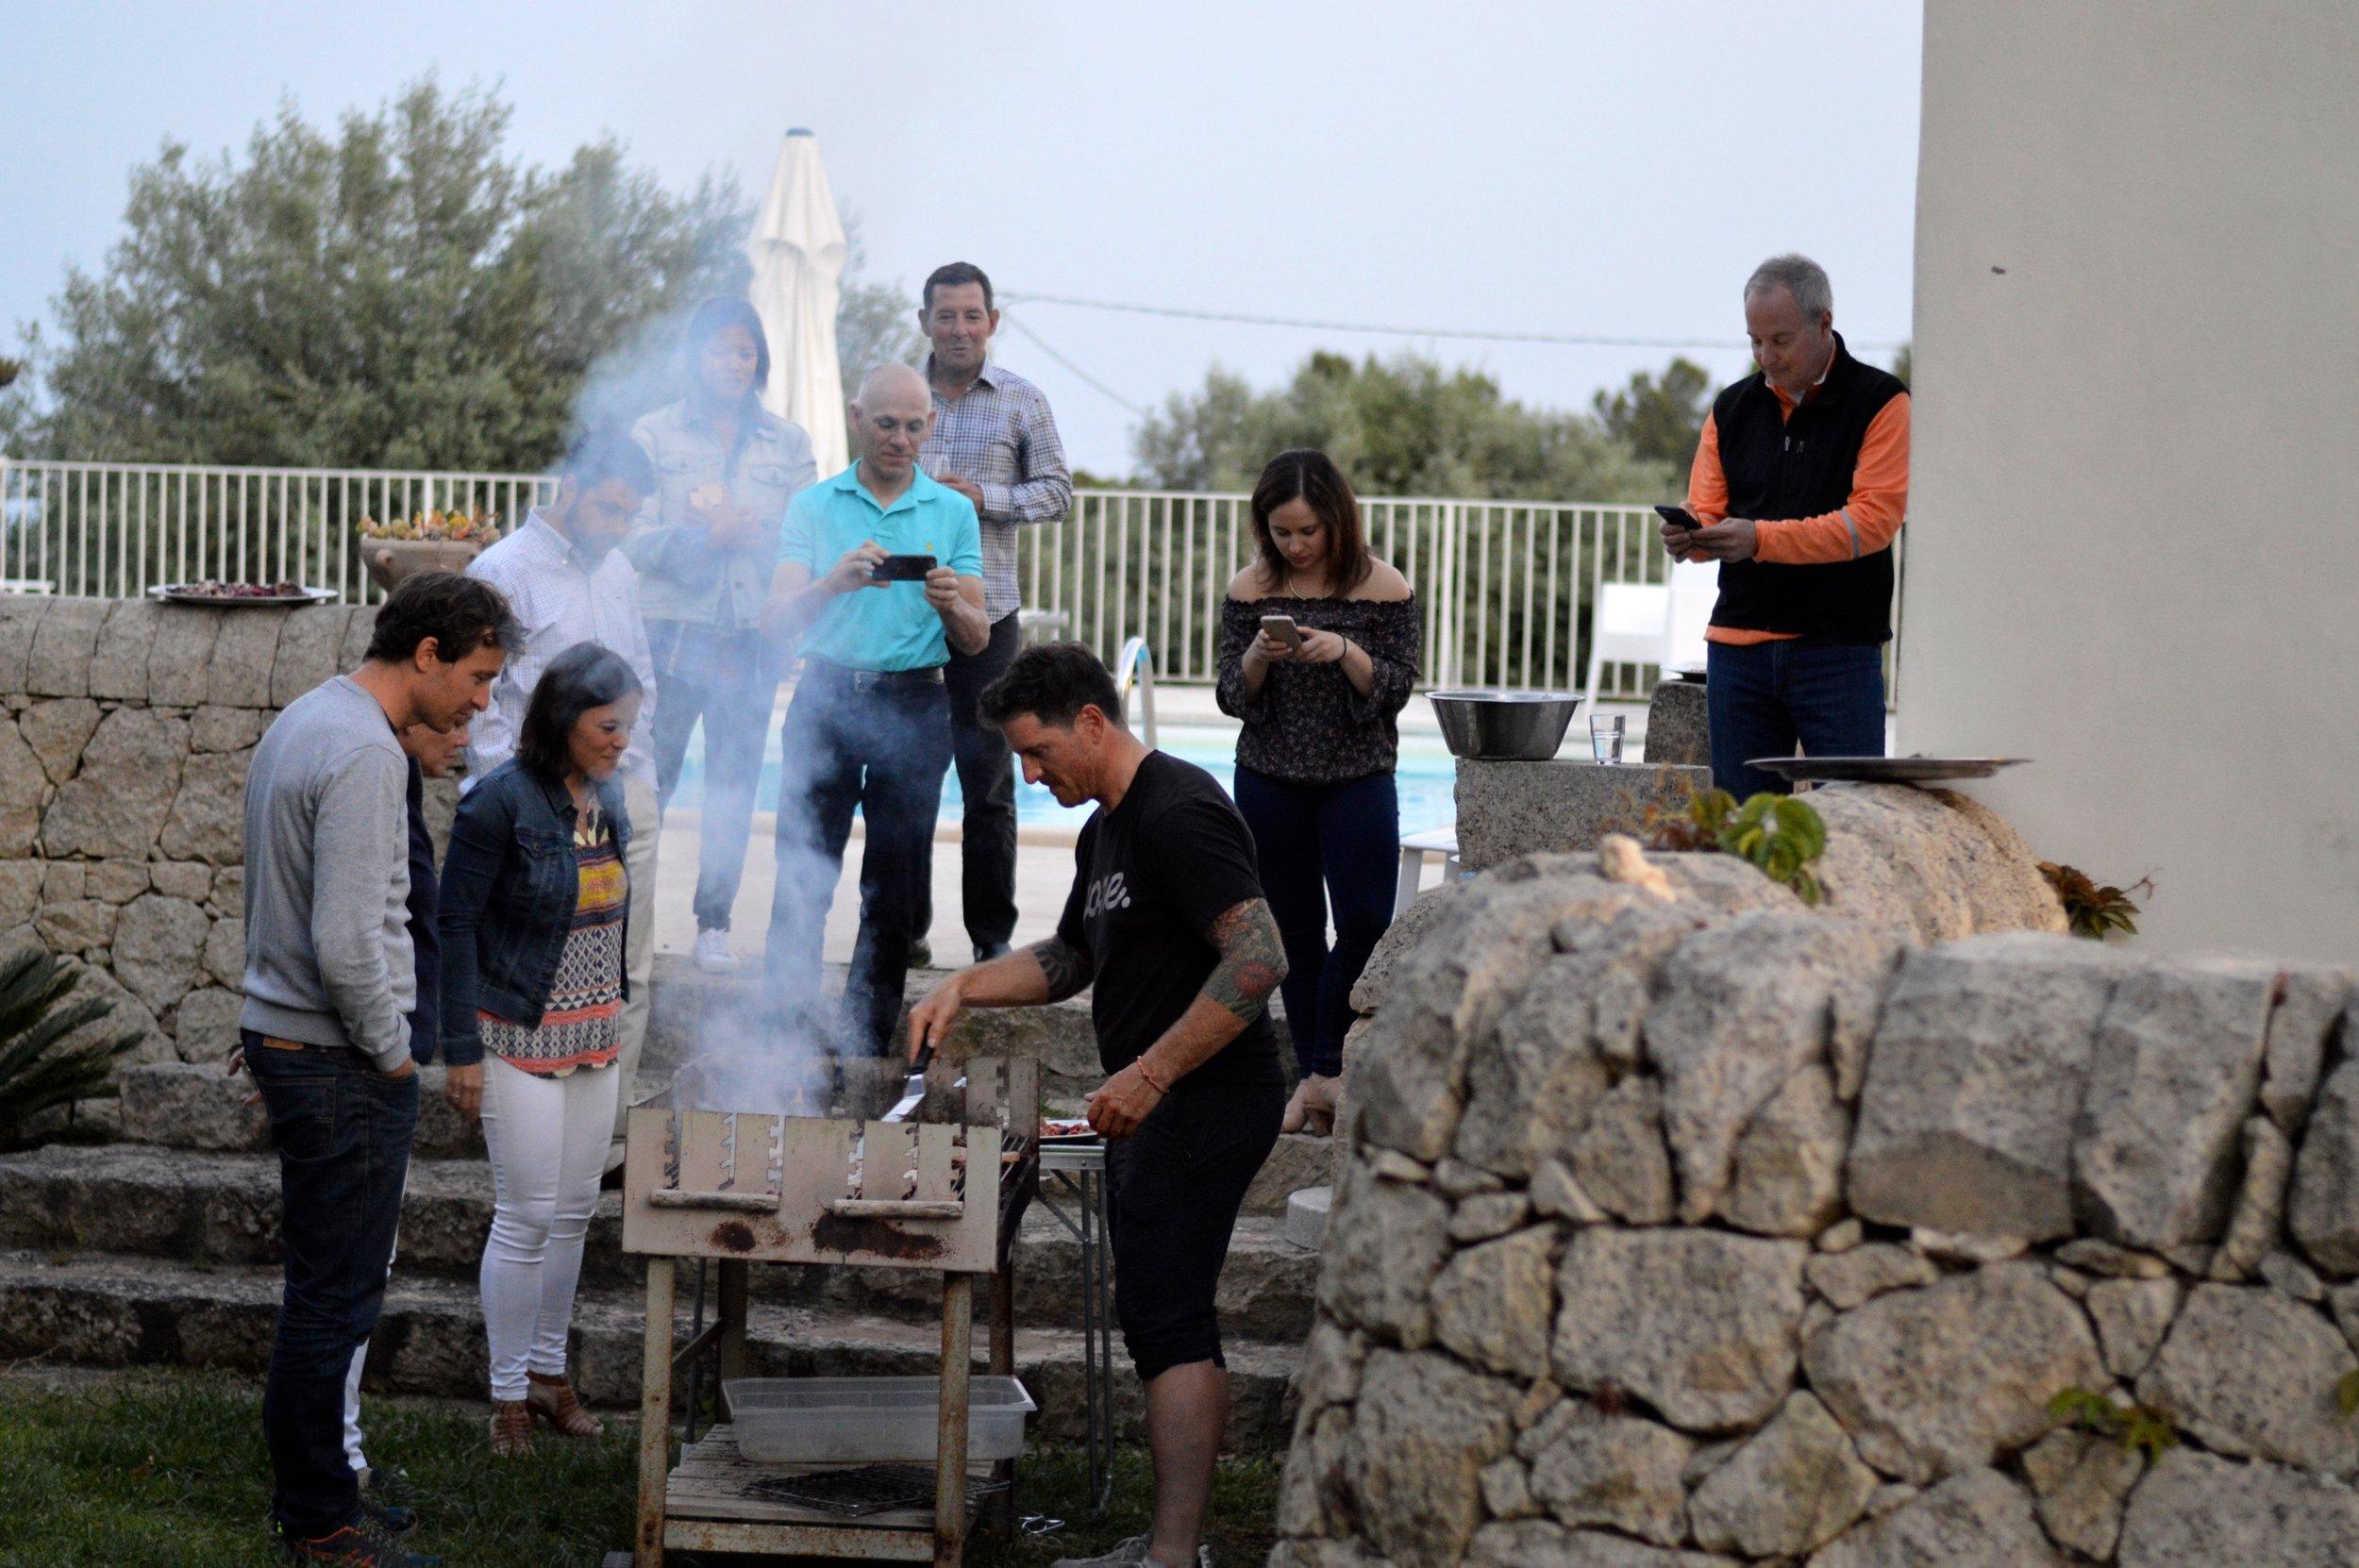 Seamus Mullen preparing dinner for guests in Sicily